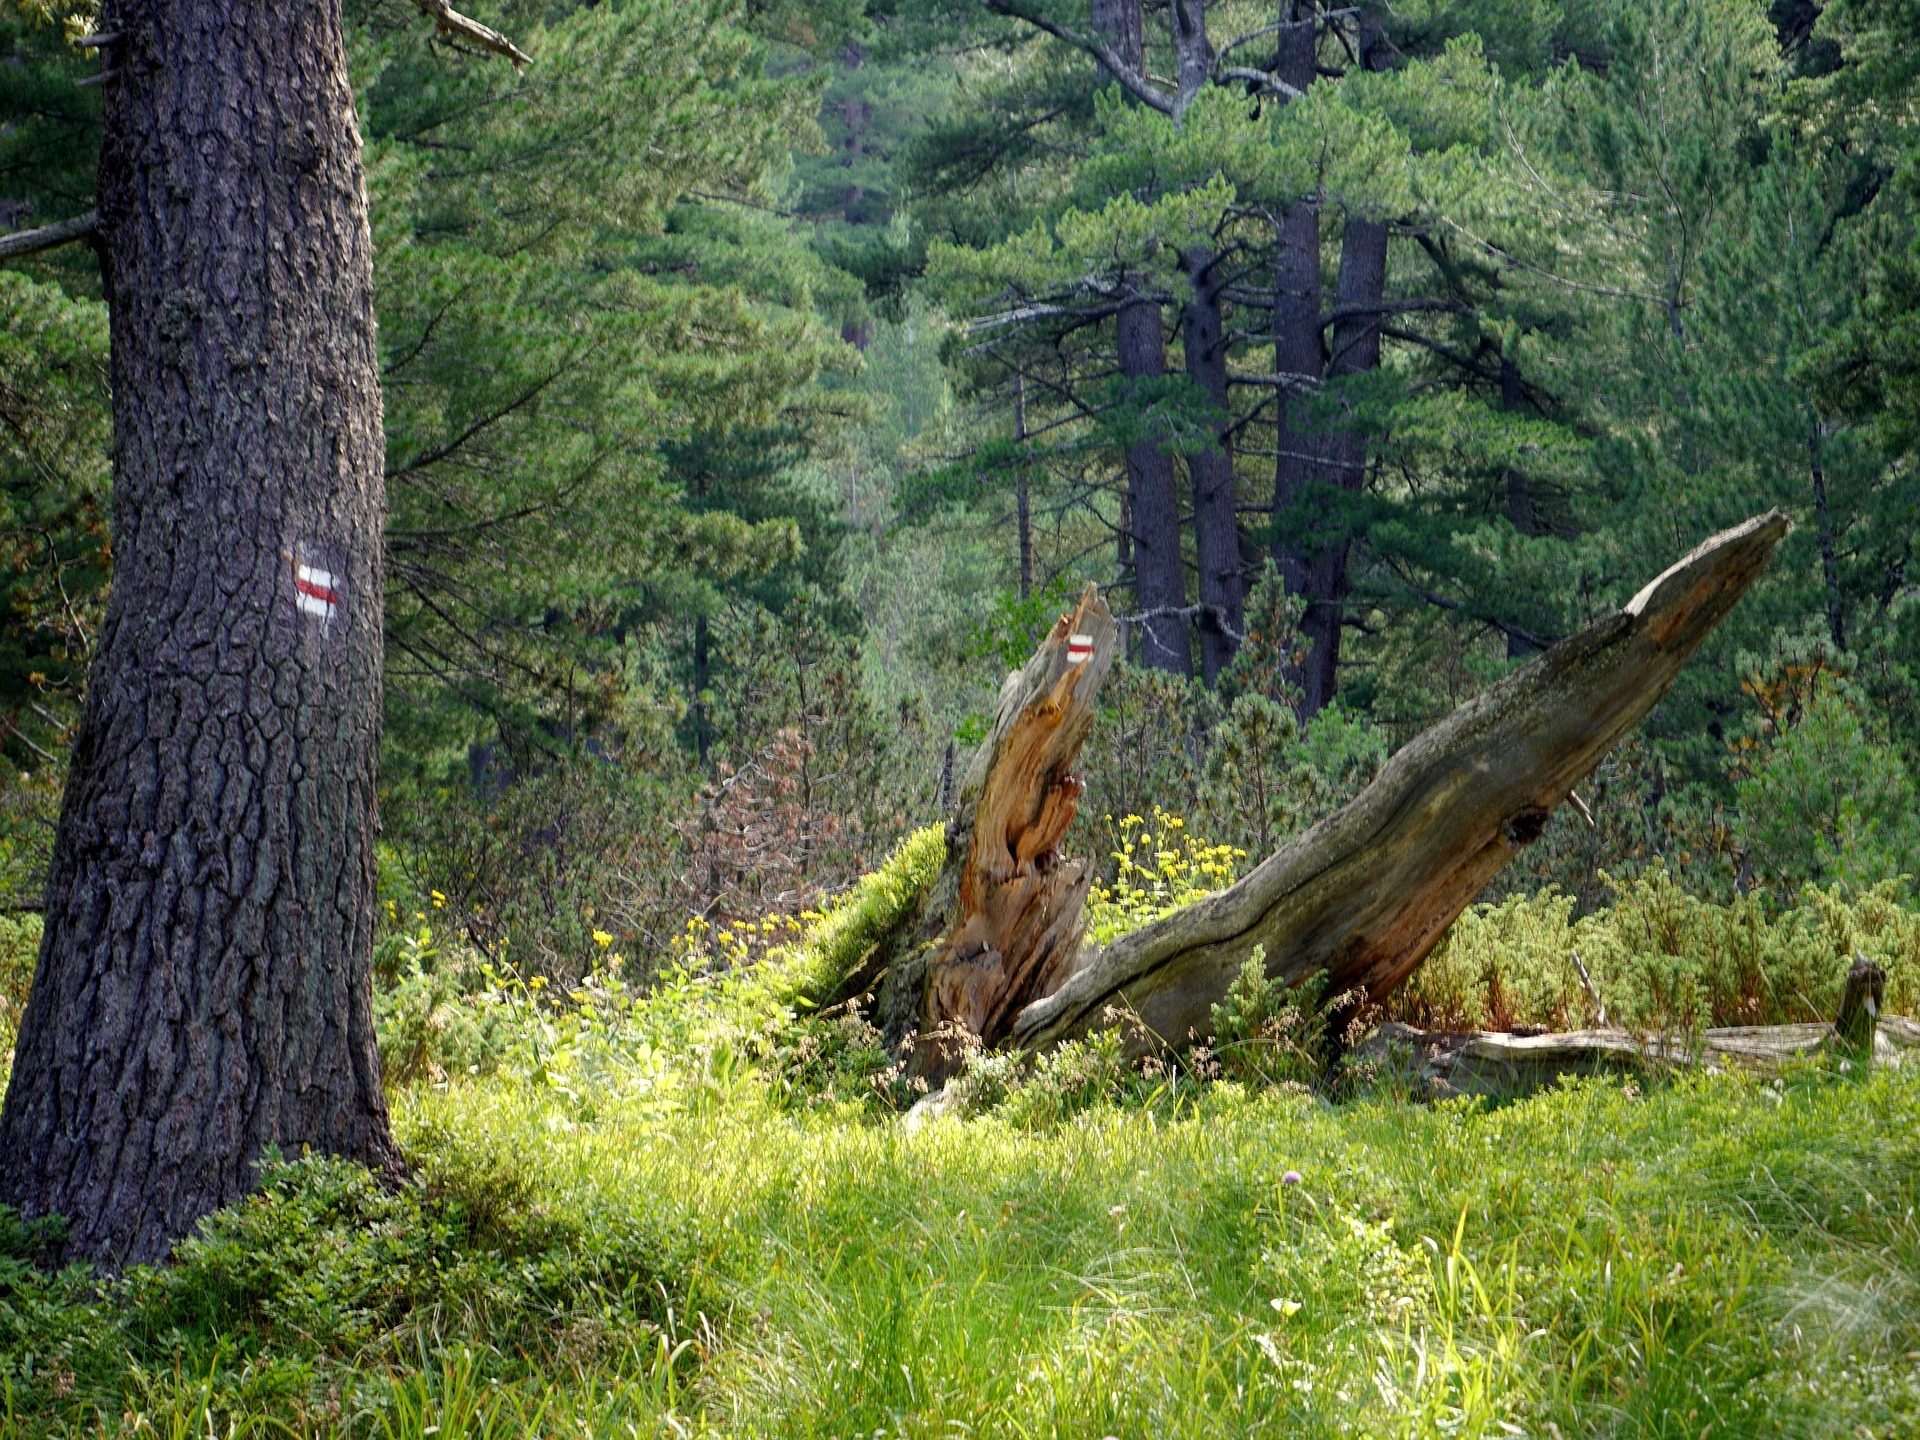 forest-1713237_1920.jpg